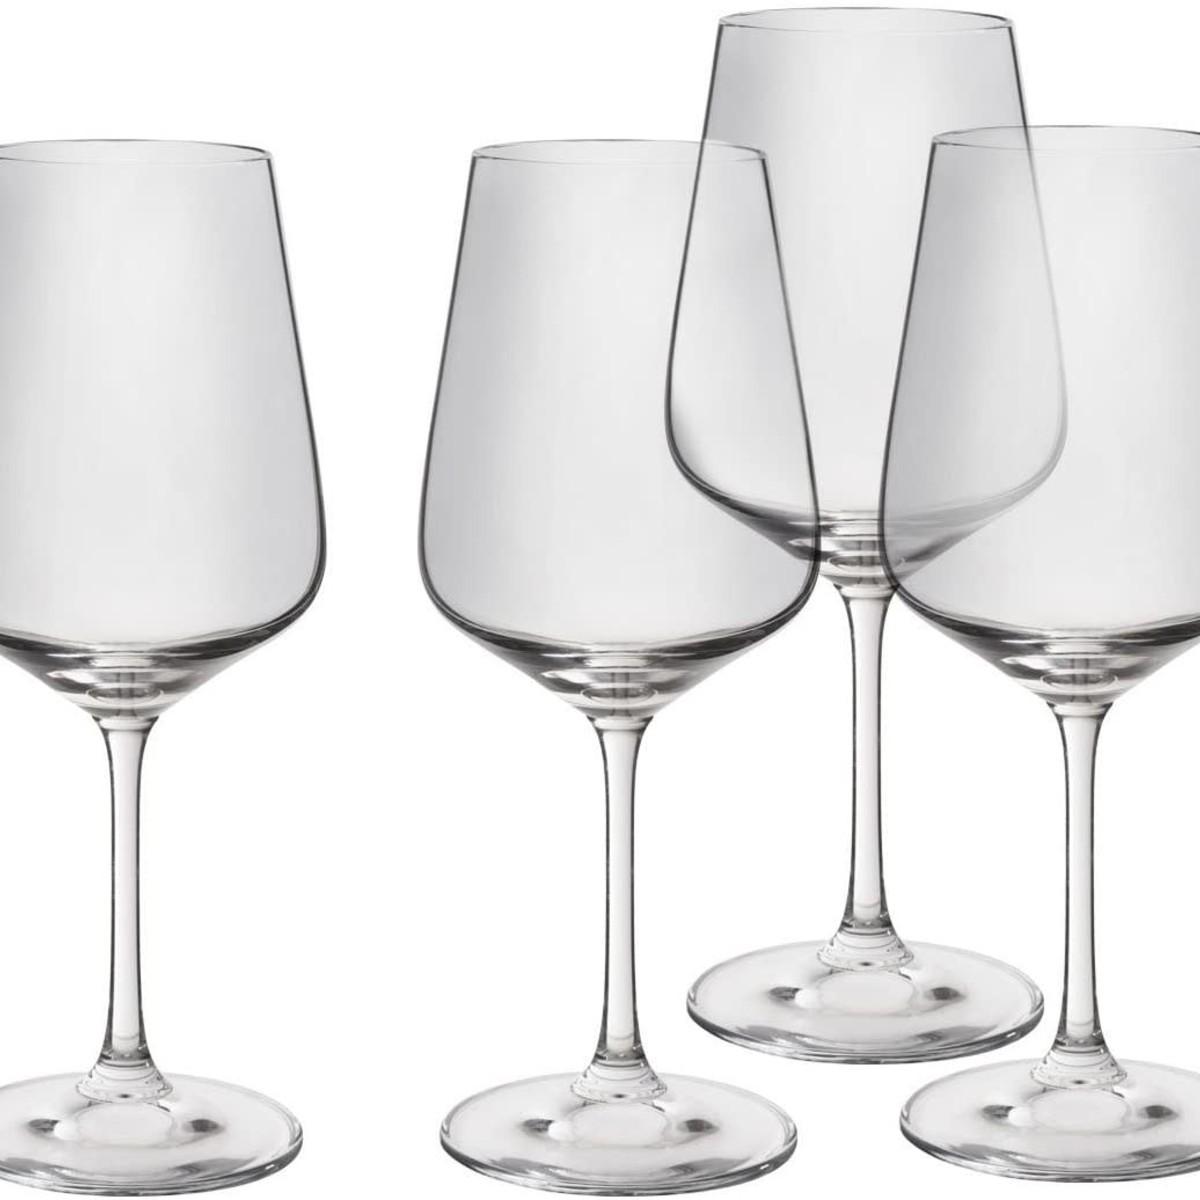 Trudeau Splendido Wine Glasses, 16oz, Set of 4